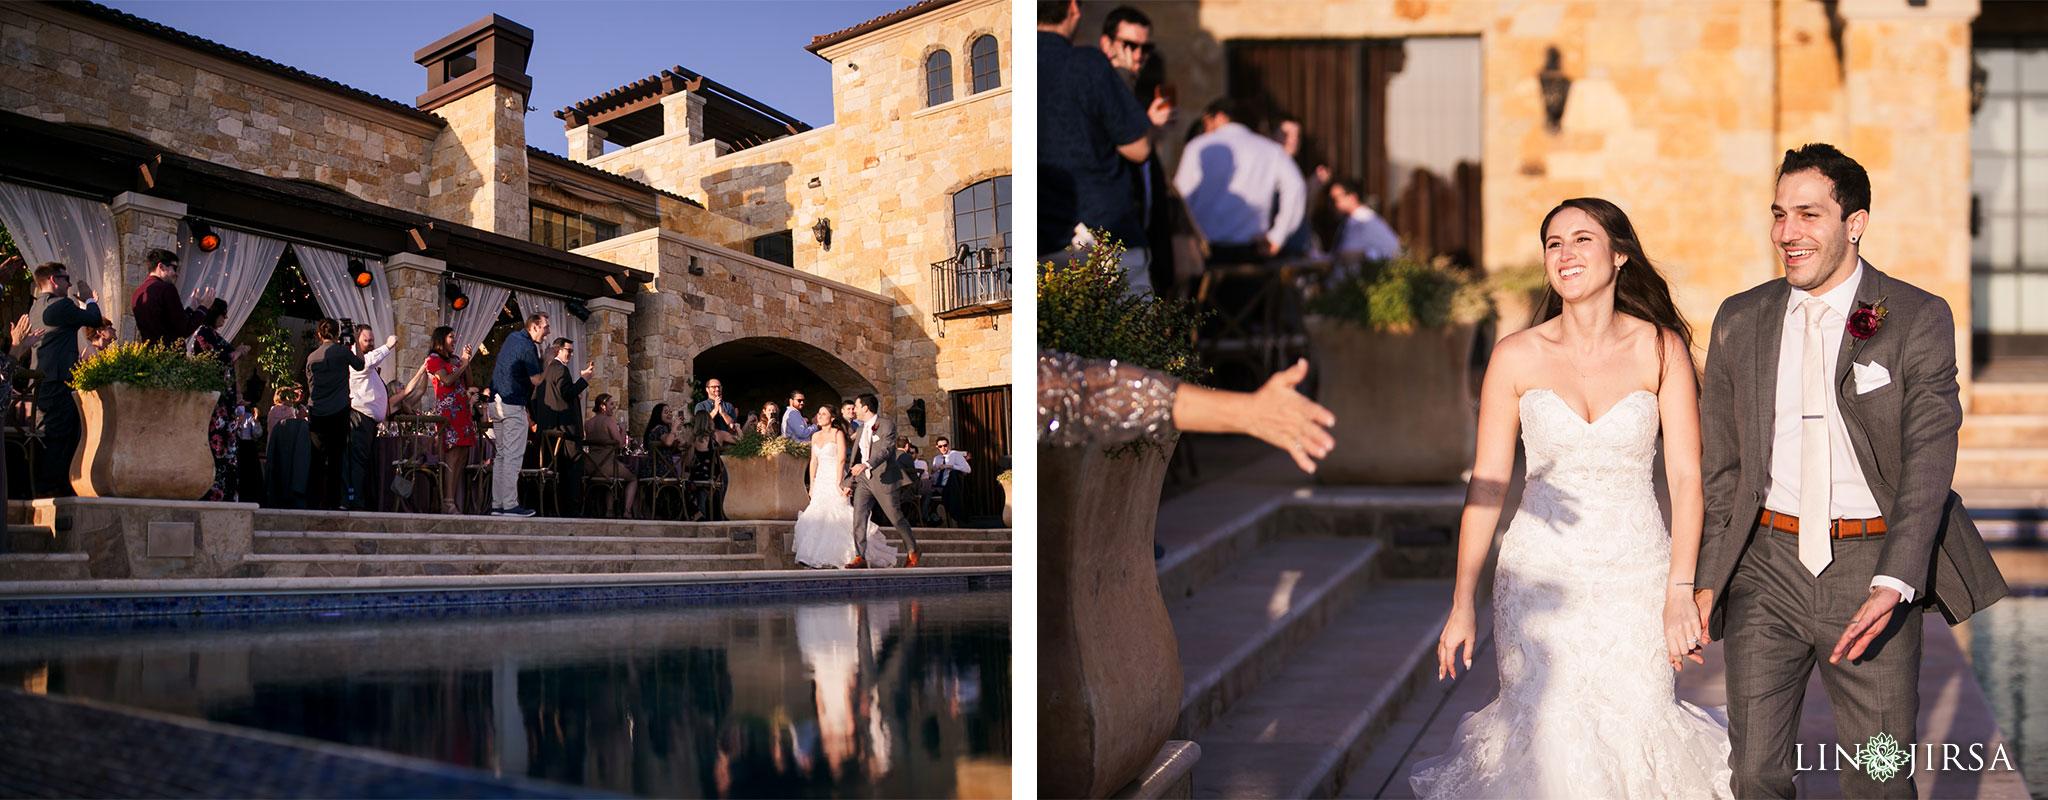 029 malibu rocky oaks wedding photography